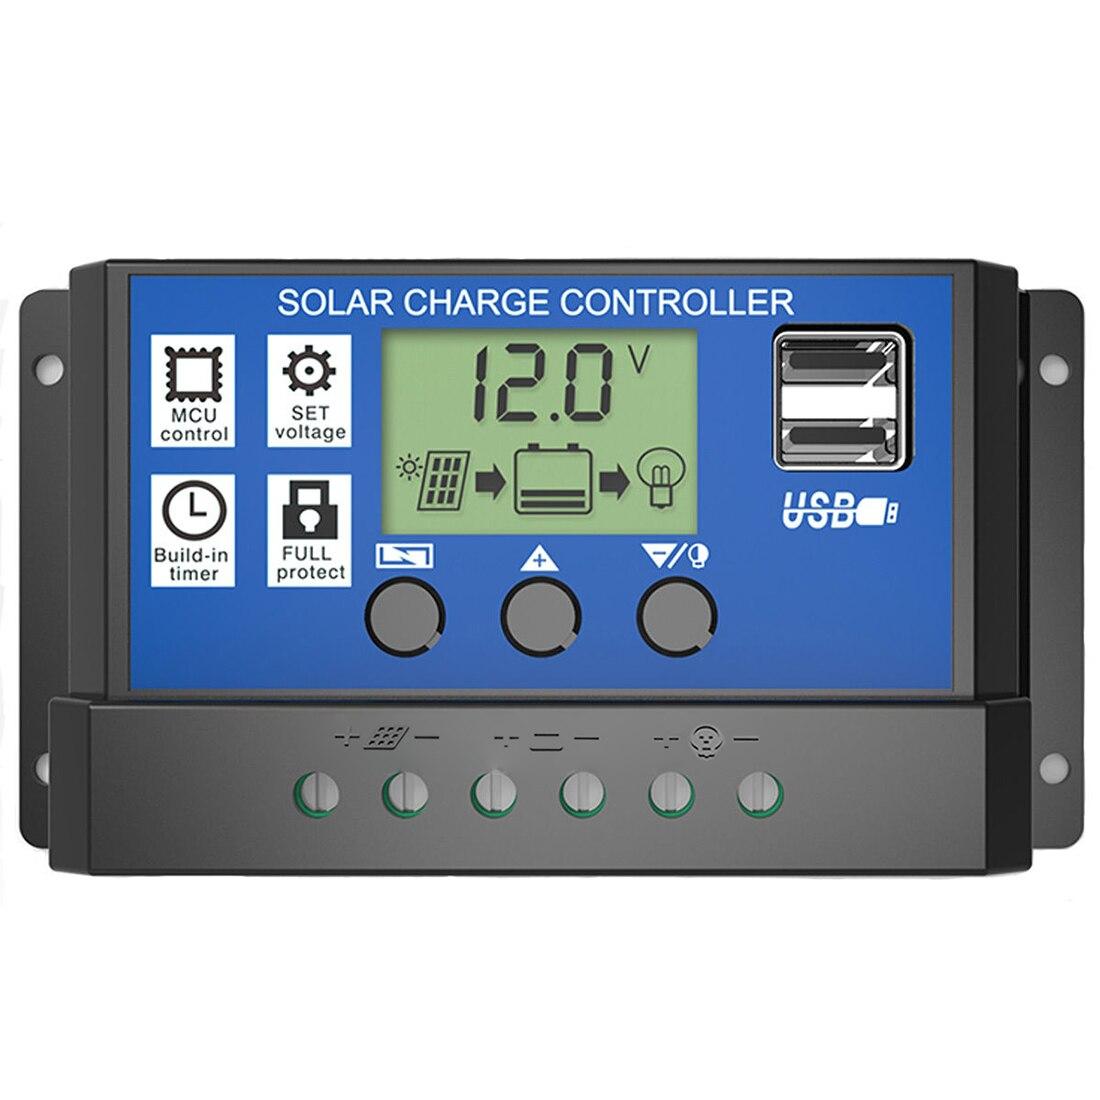 PWM 10/20/30Aควบคุมการประจุพลังงานแสงอาทิตย์12โวลต์24โวลต์จอแสดงผลLCDแบบDual USBแผงเซลล์แสงอาทิตย์ค่าใช้...